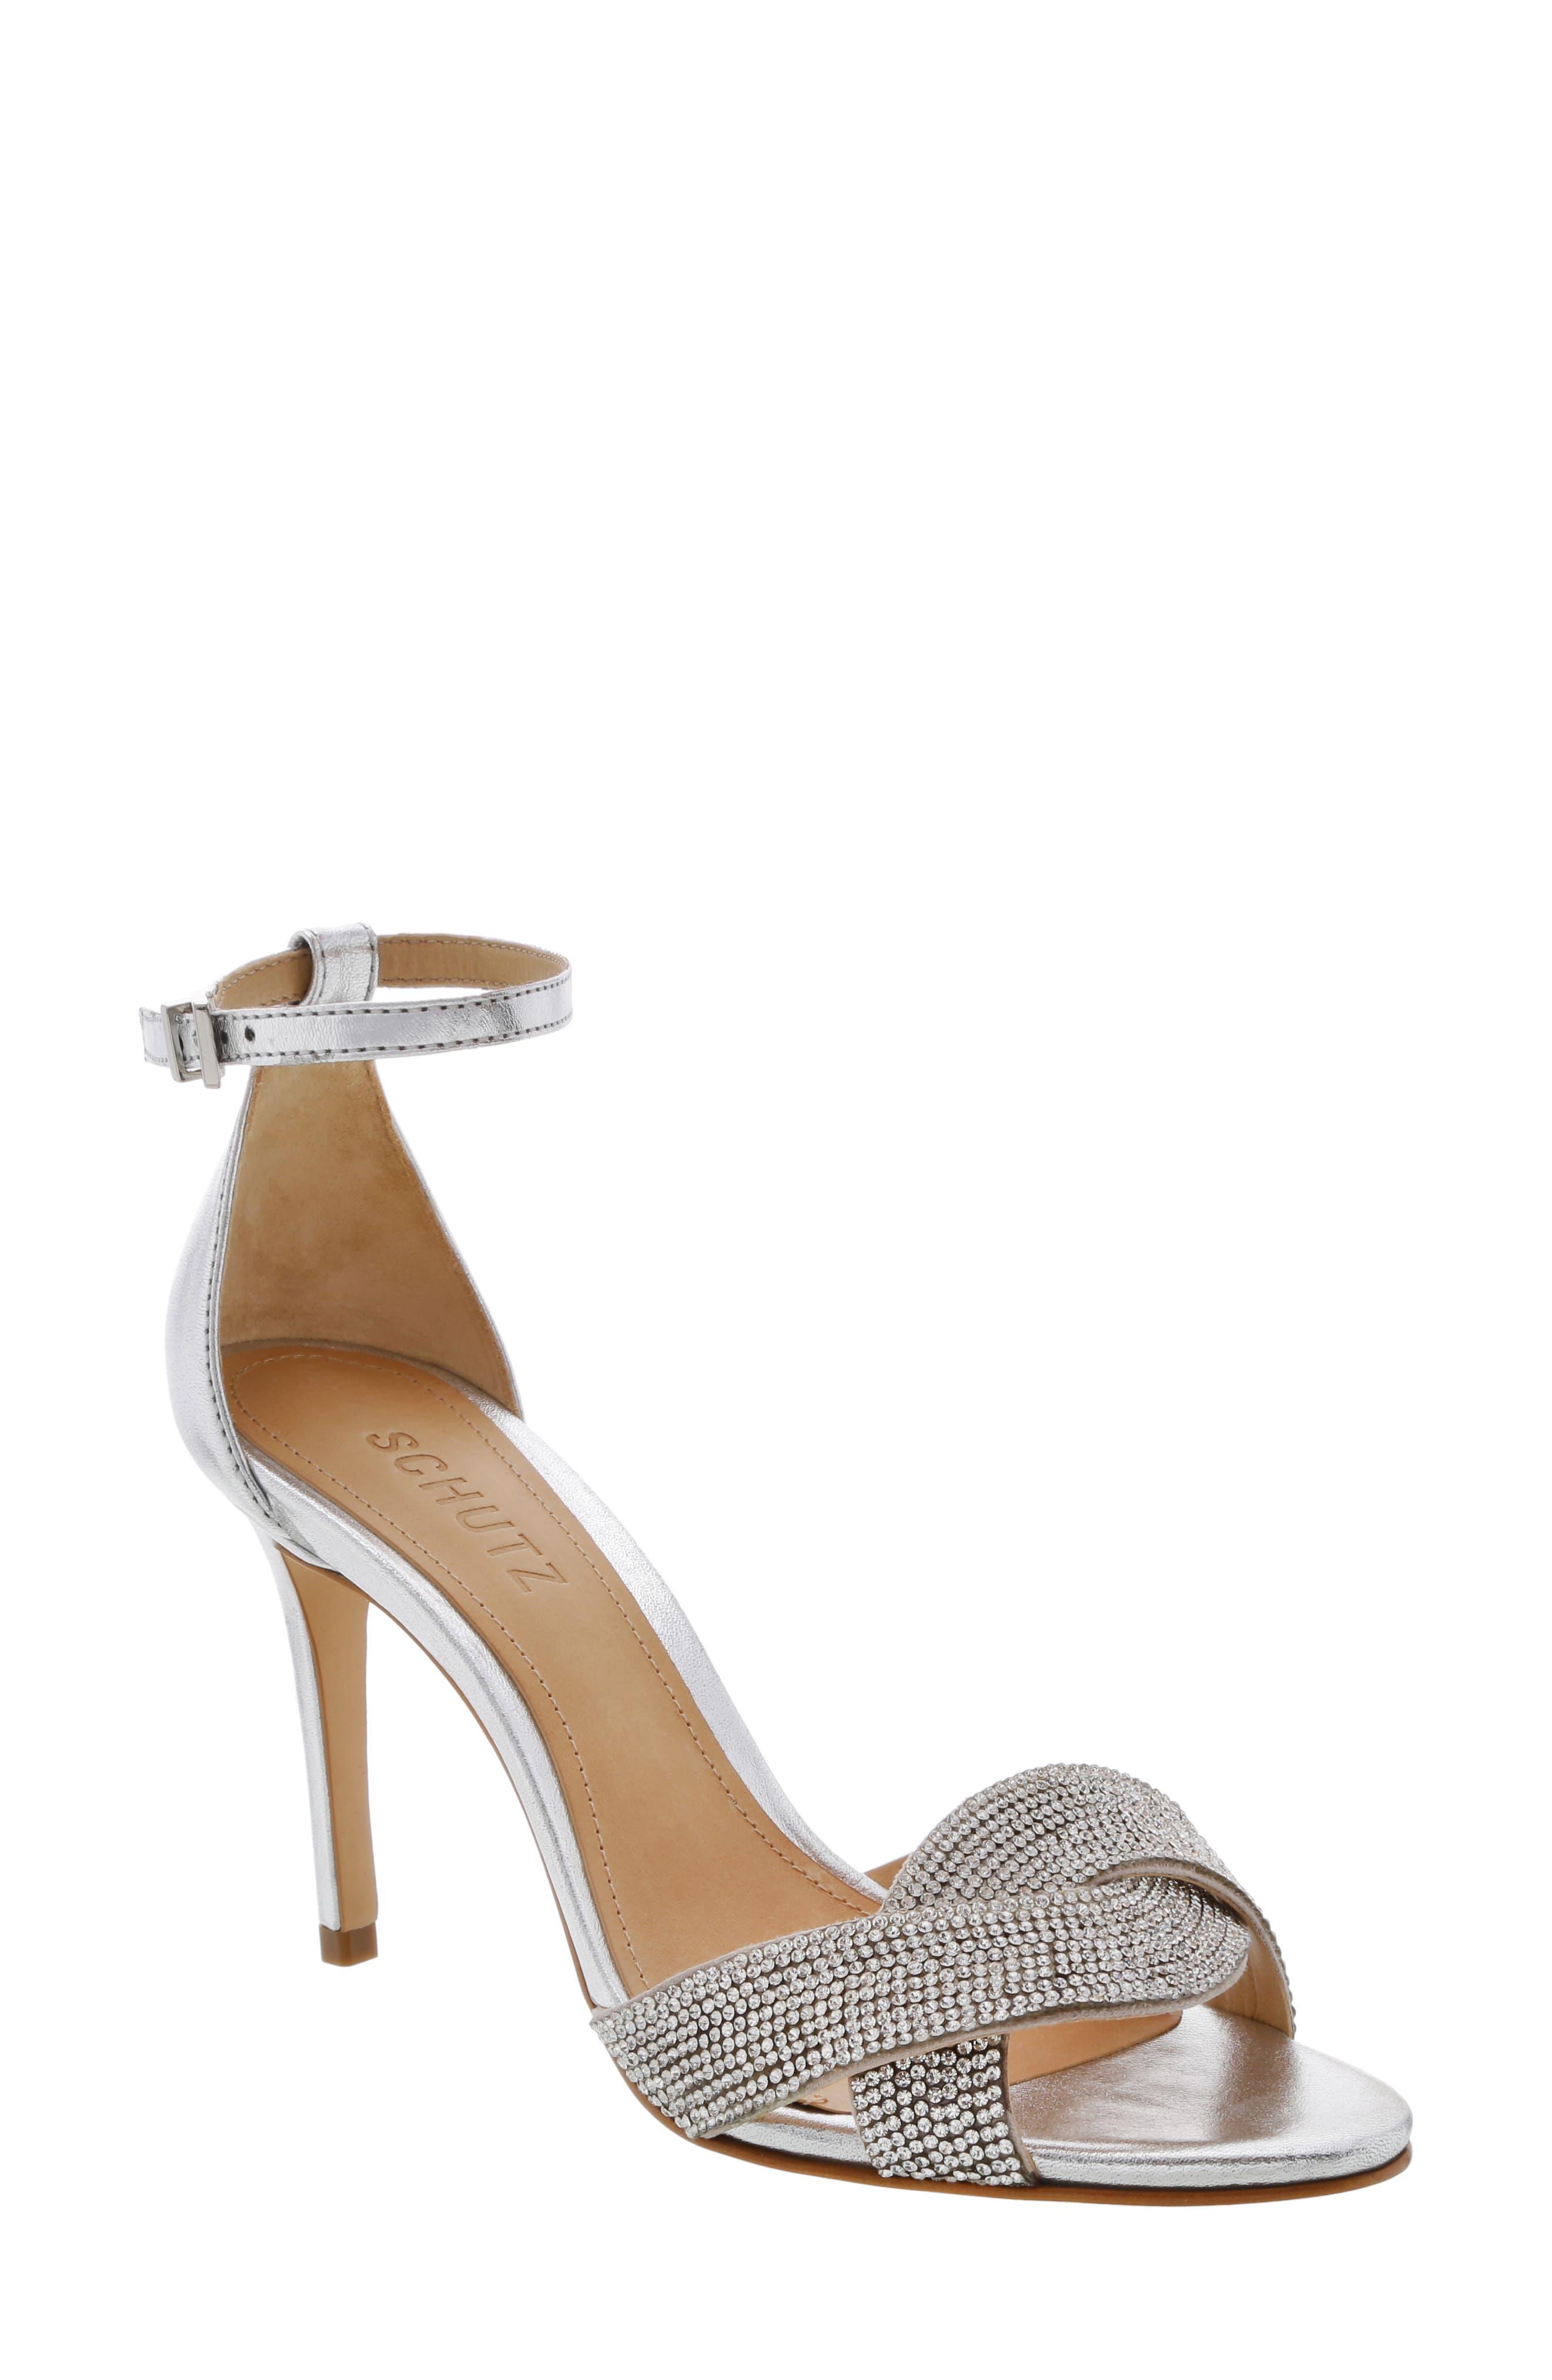 Schutz Jolita Ankle Strap Sandal- Metallic